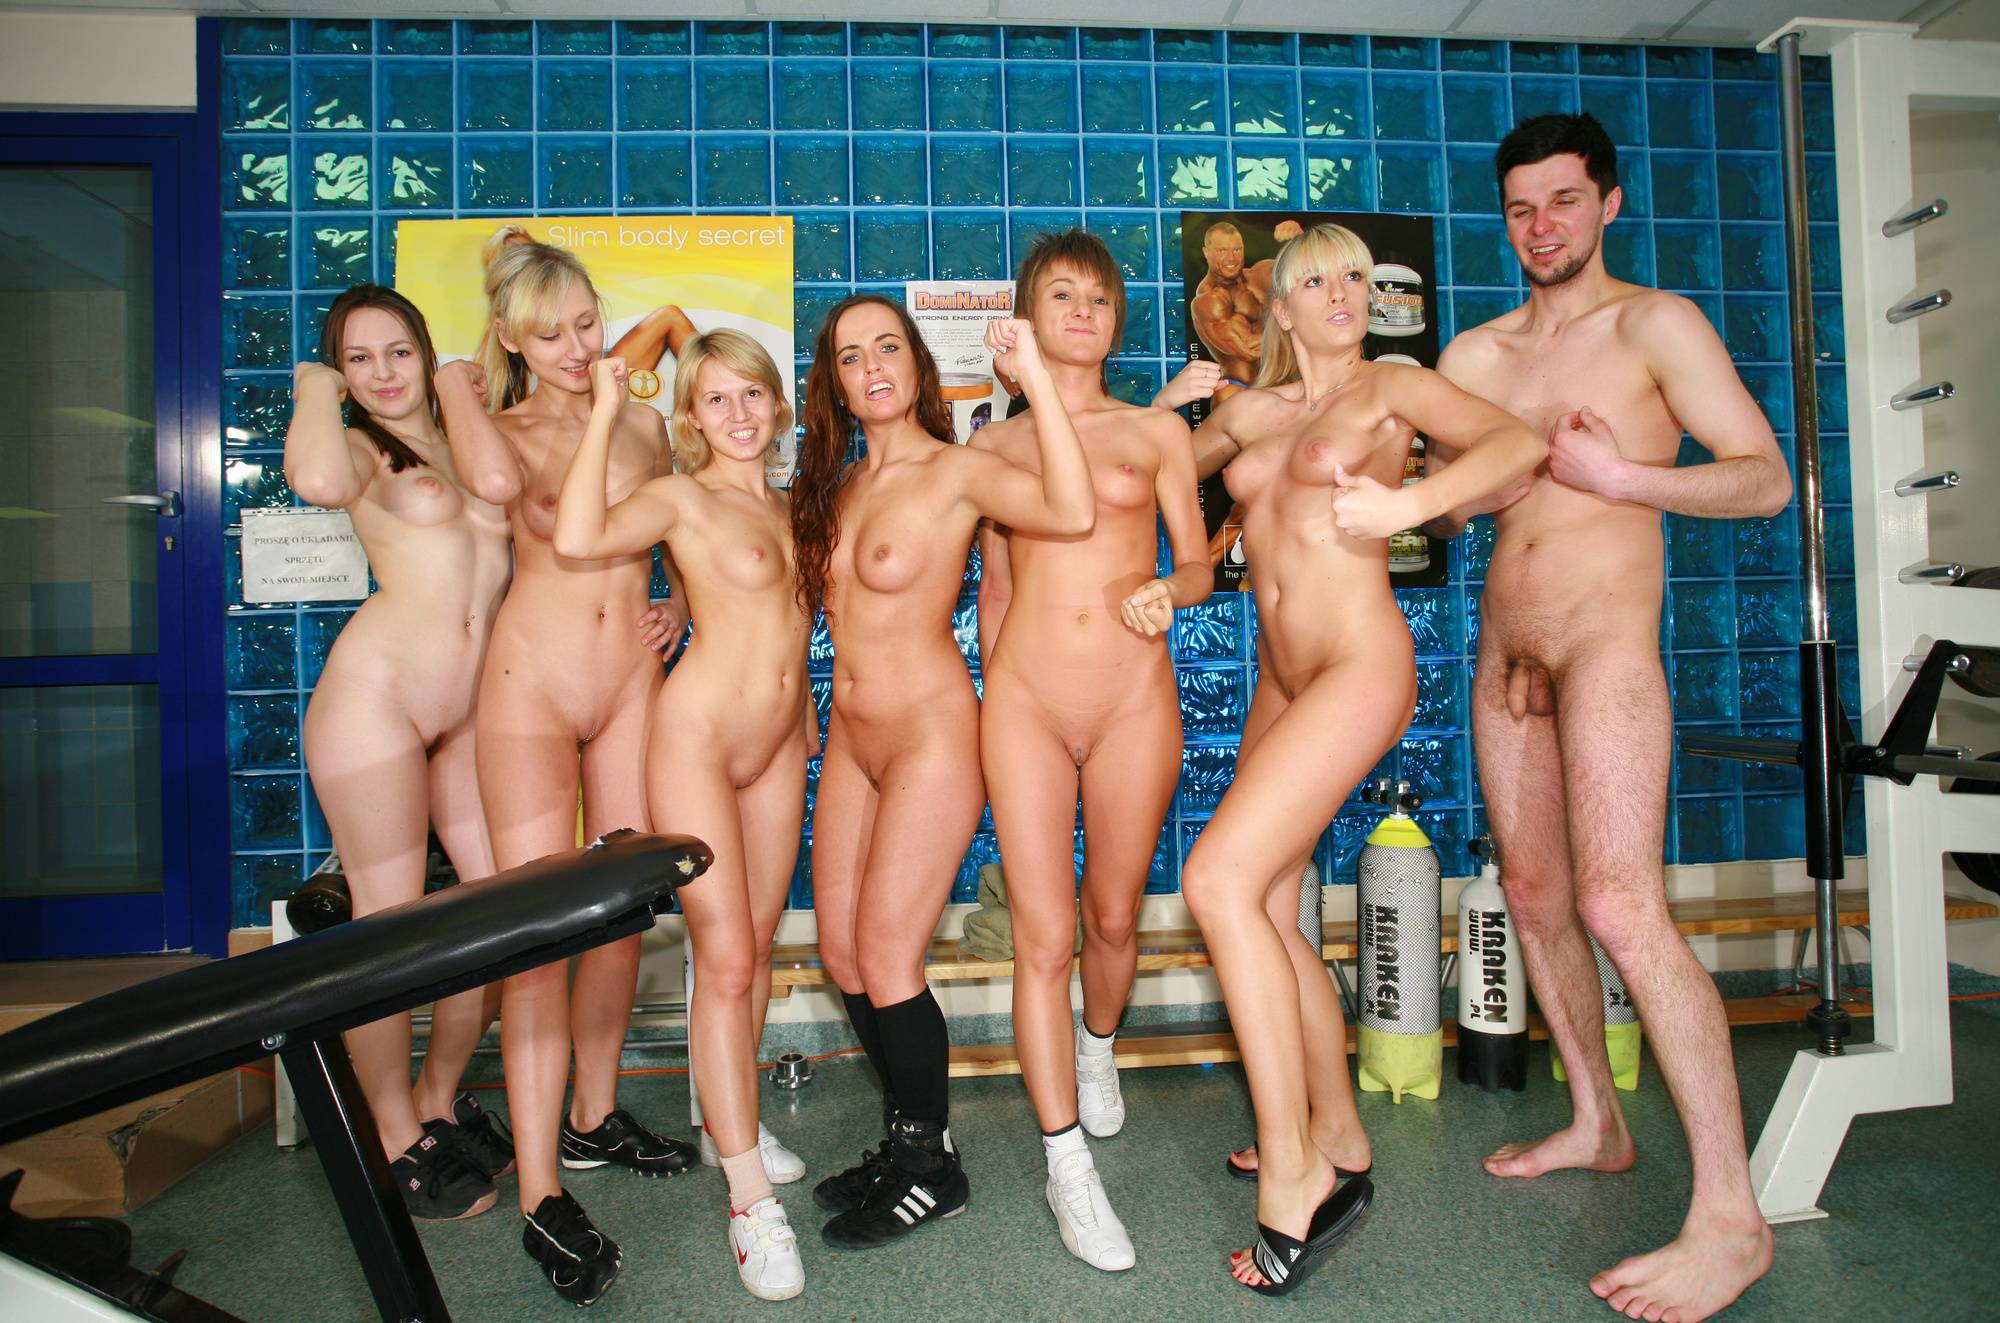 Scuba Gym Group Session - 2